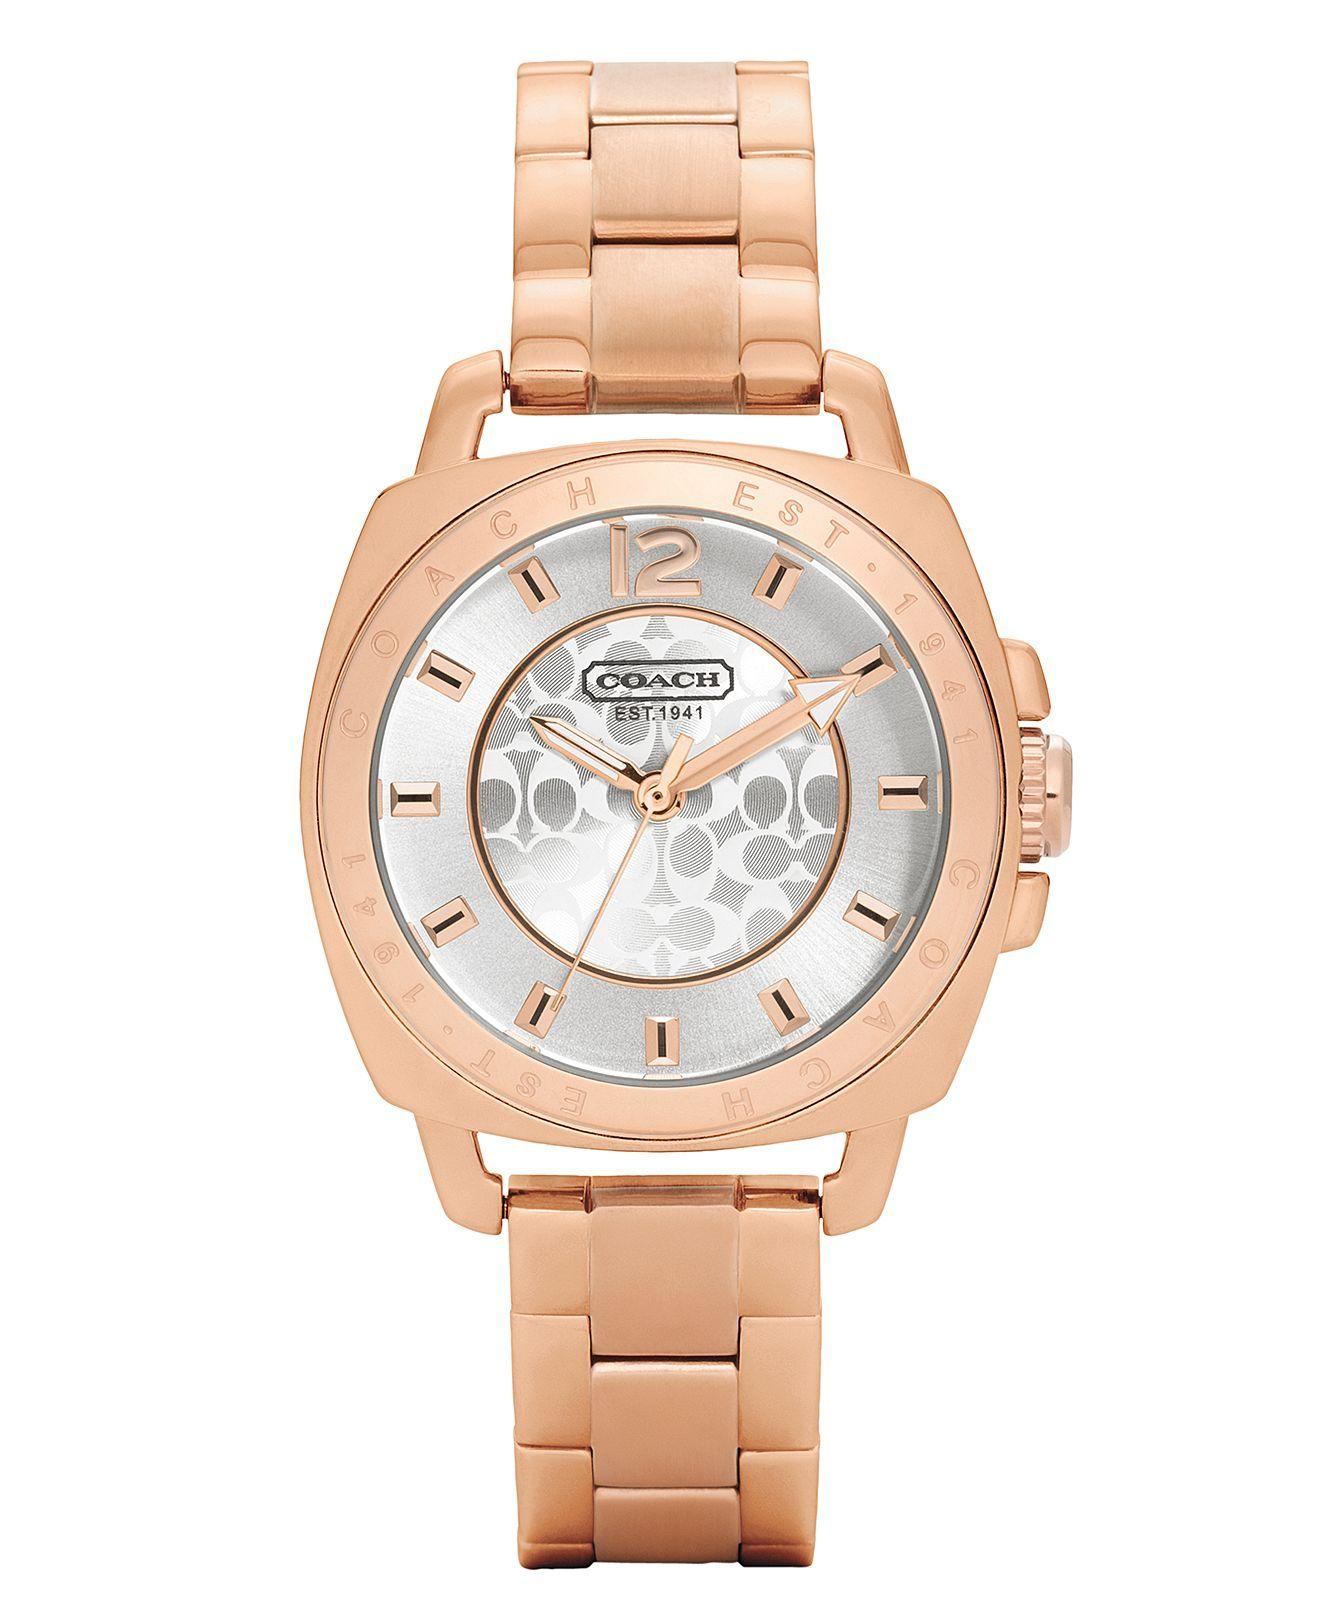 COACH BOYFRIEND MINI BRACELET WATCH - Women's Watches ...